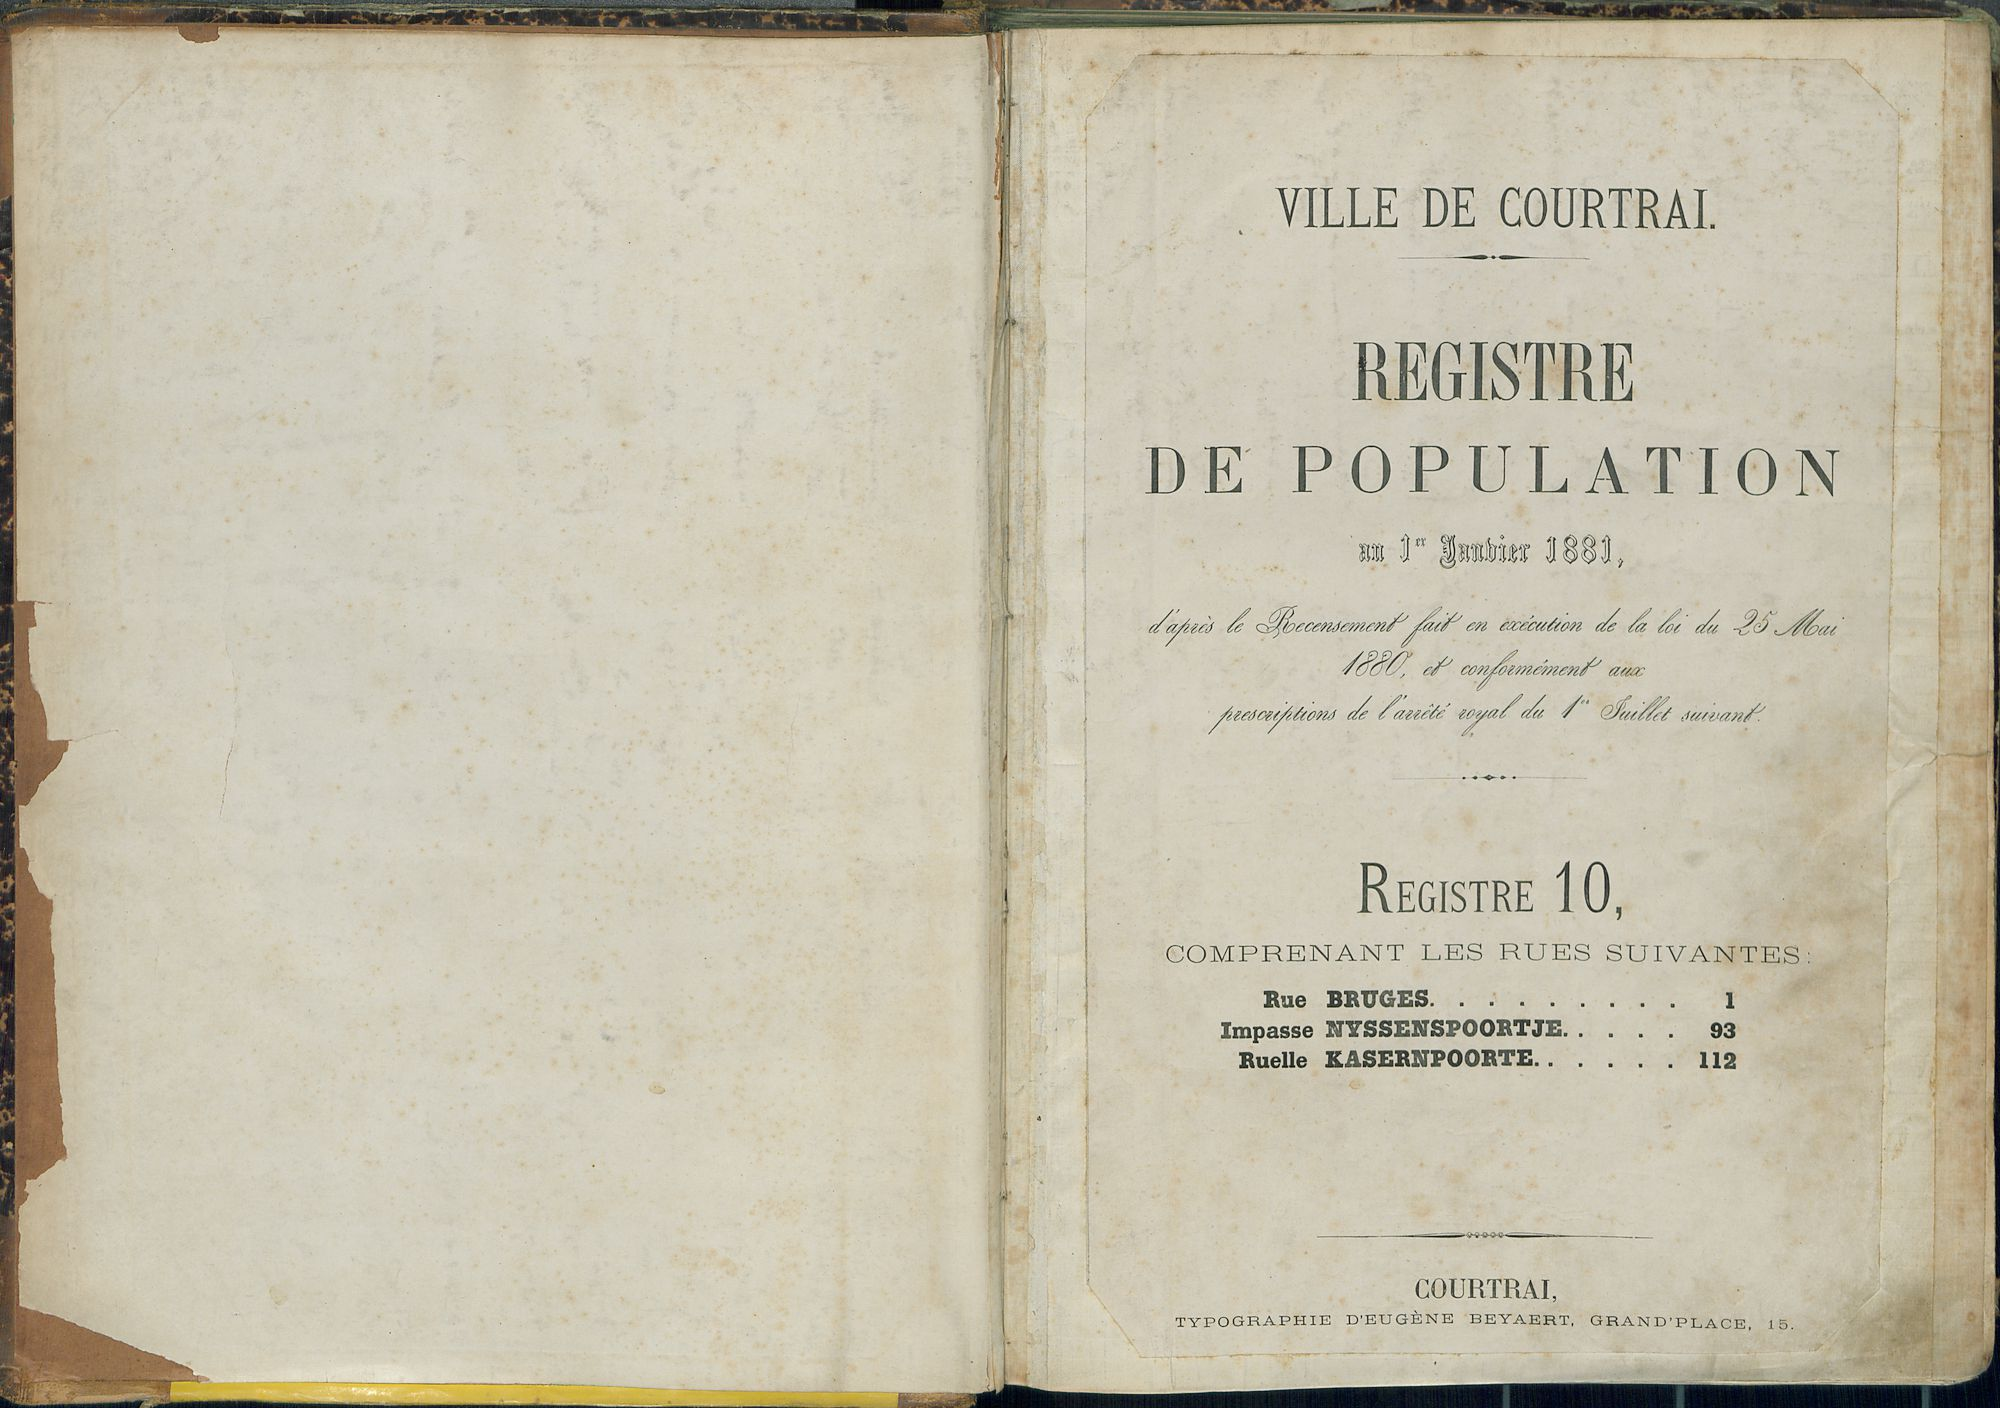 Bevolkingsregister Kortrijk 1880 boek 10